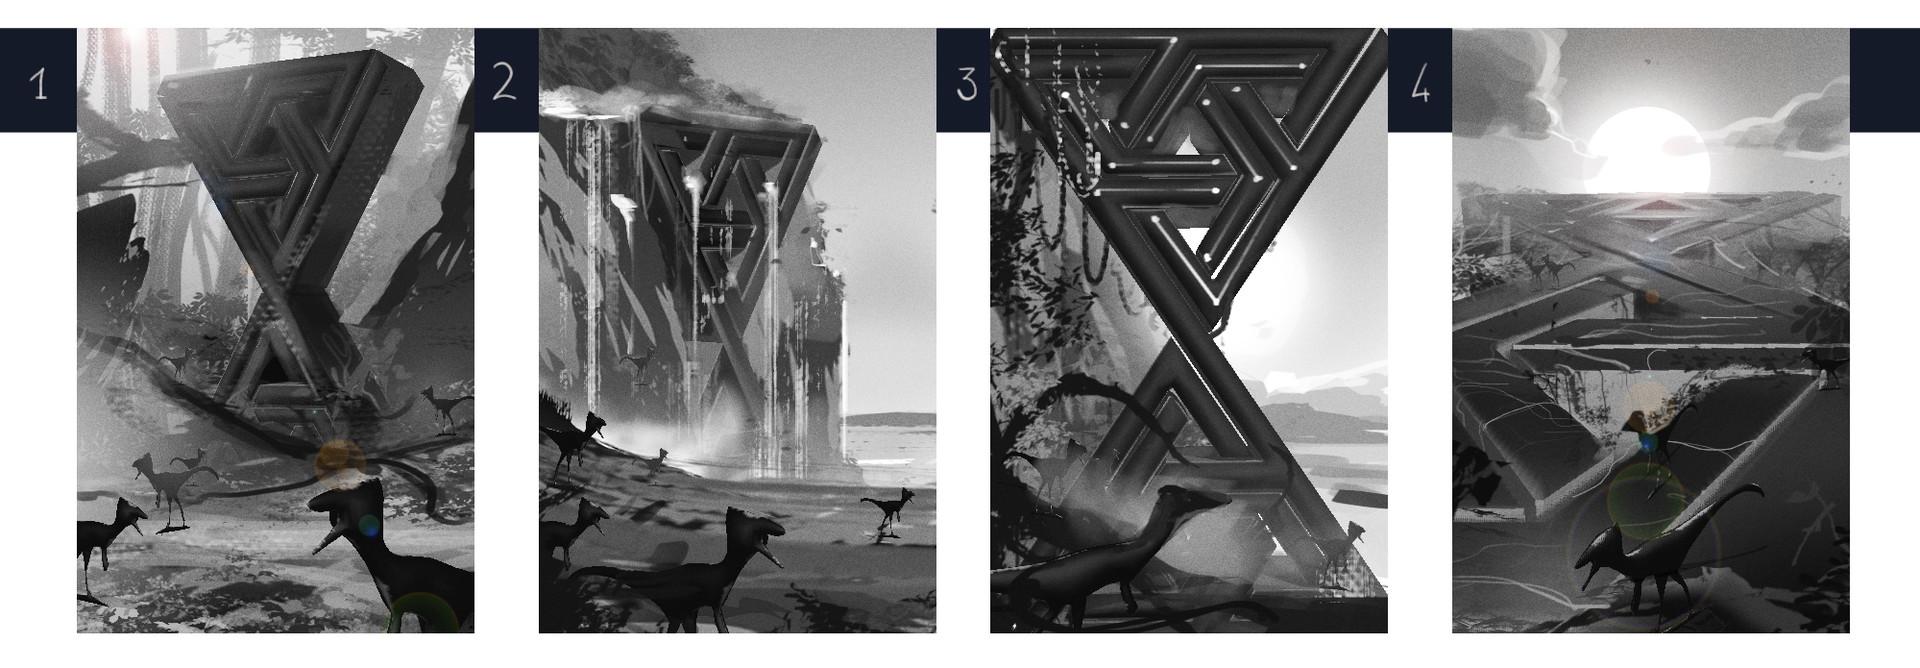 Alexandr iwaac cover sketches